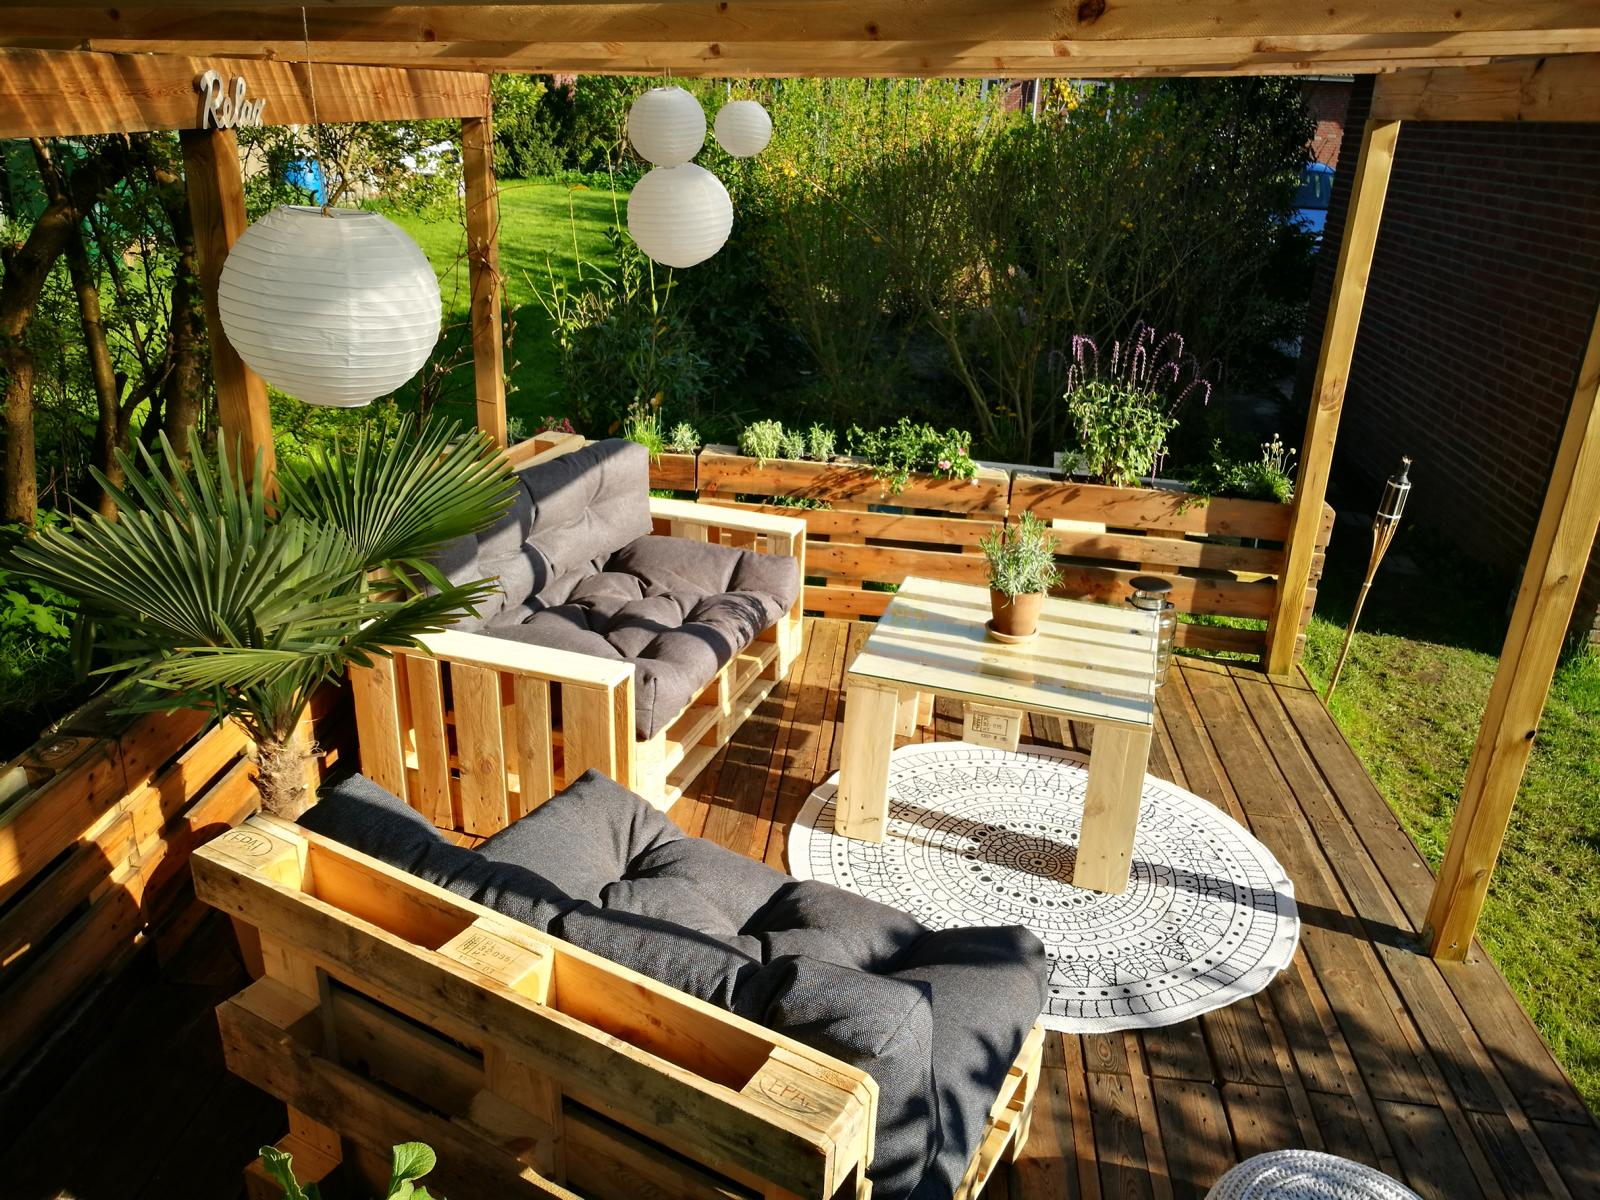 paletten lounge bauen kaufen palettenm bel shop. Black Bedroom Furniture Sets. Home Design Ideas